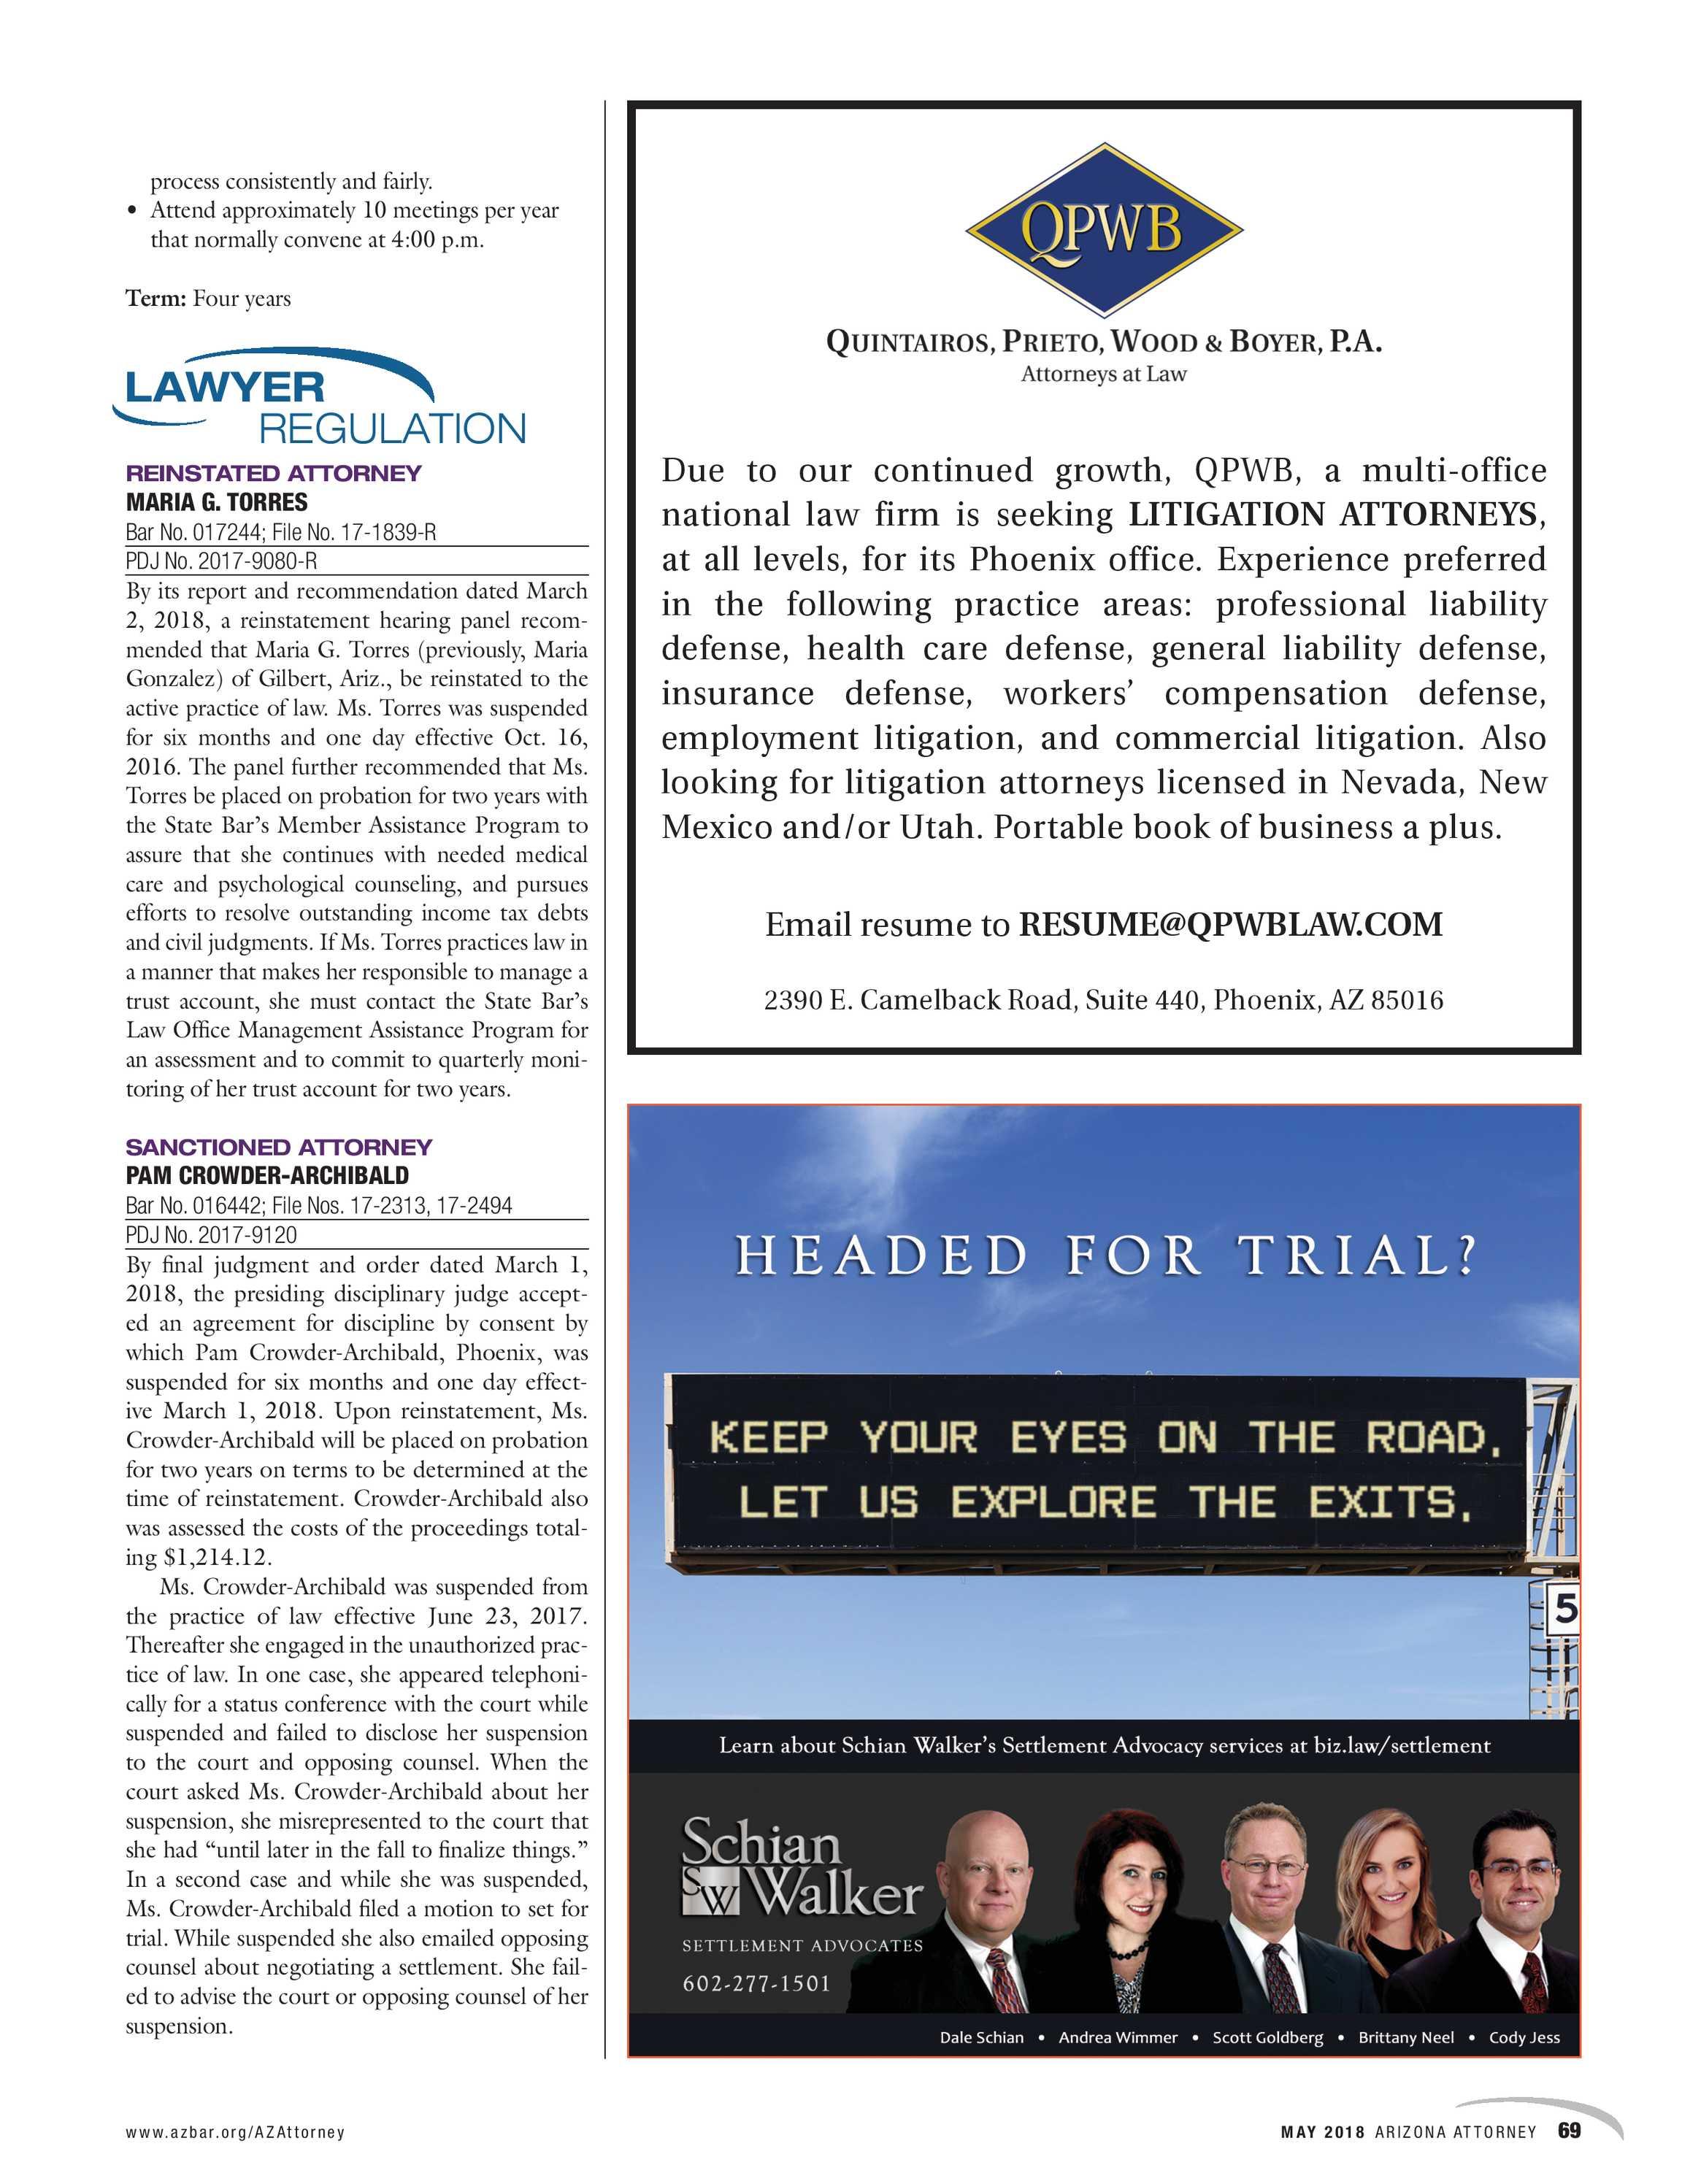 Arizona Attorney May 2018 Page 69